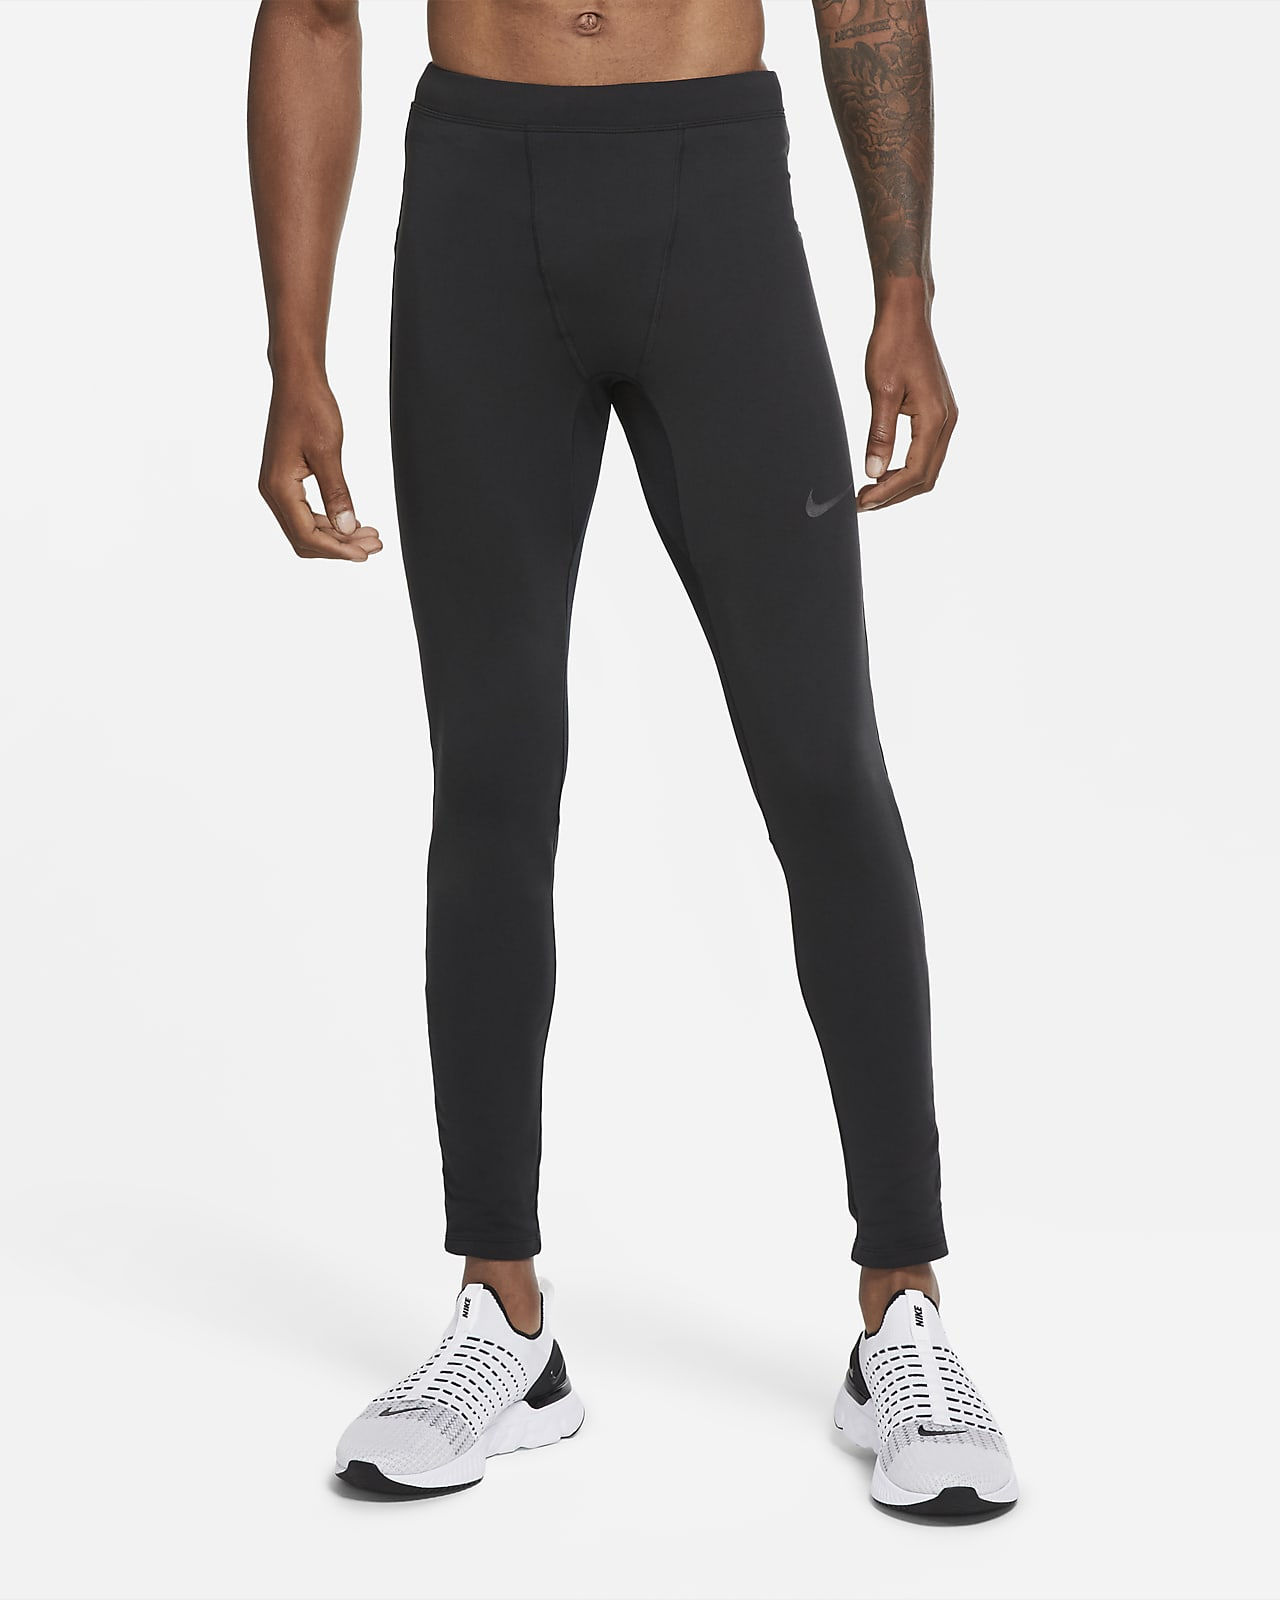 Nike Run Men's Thermal Running Tights